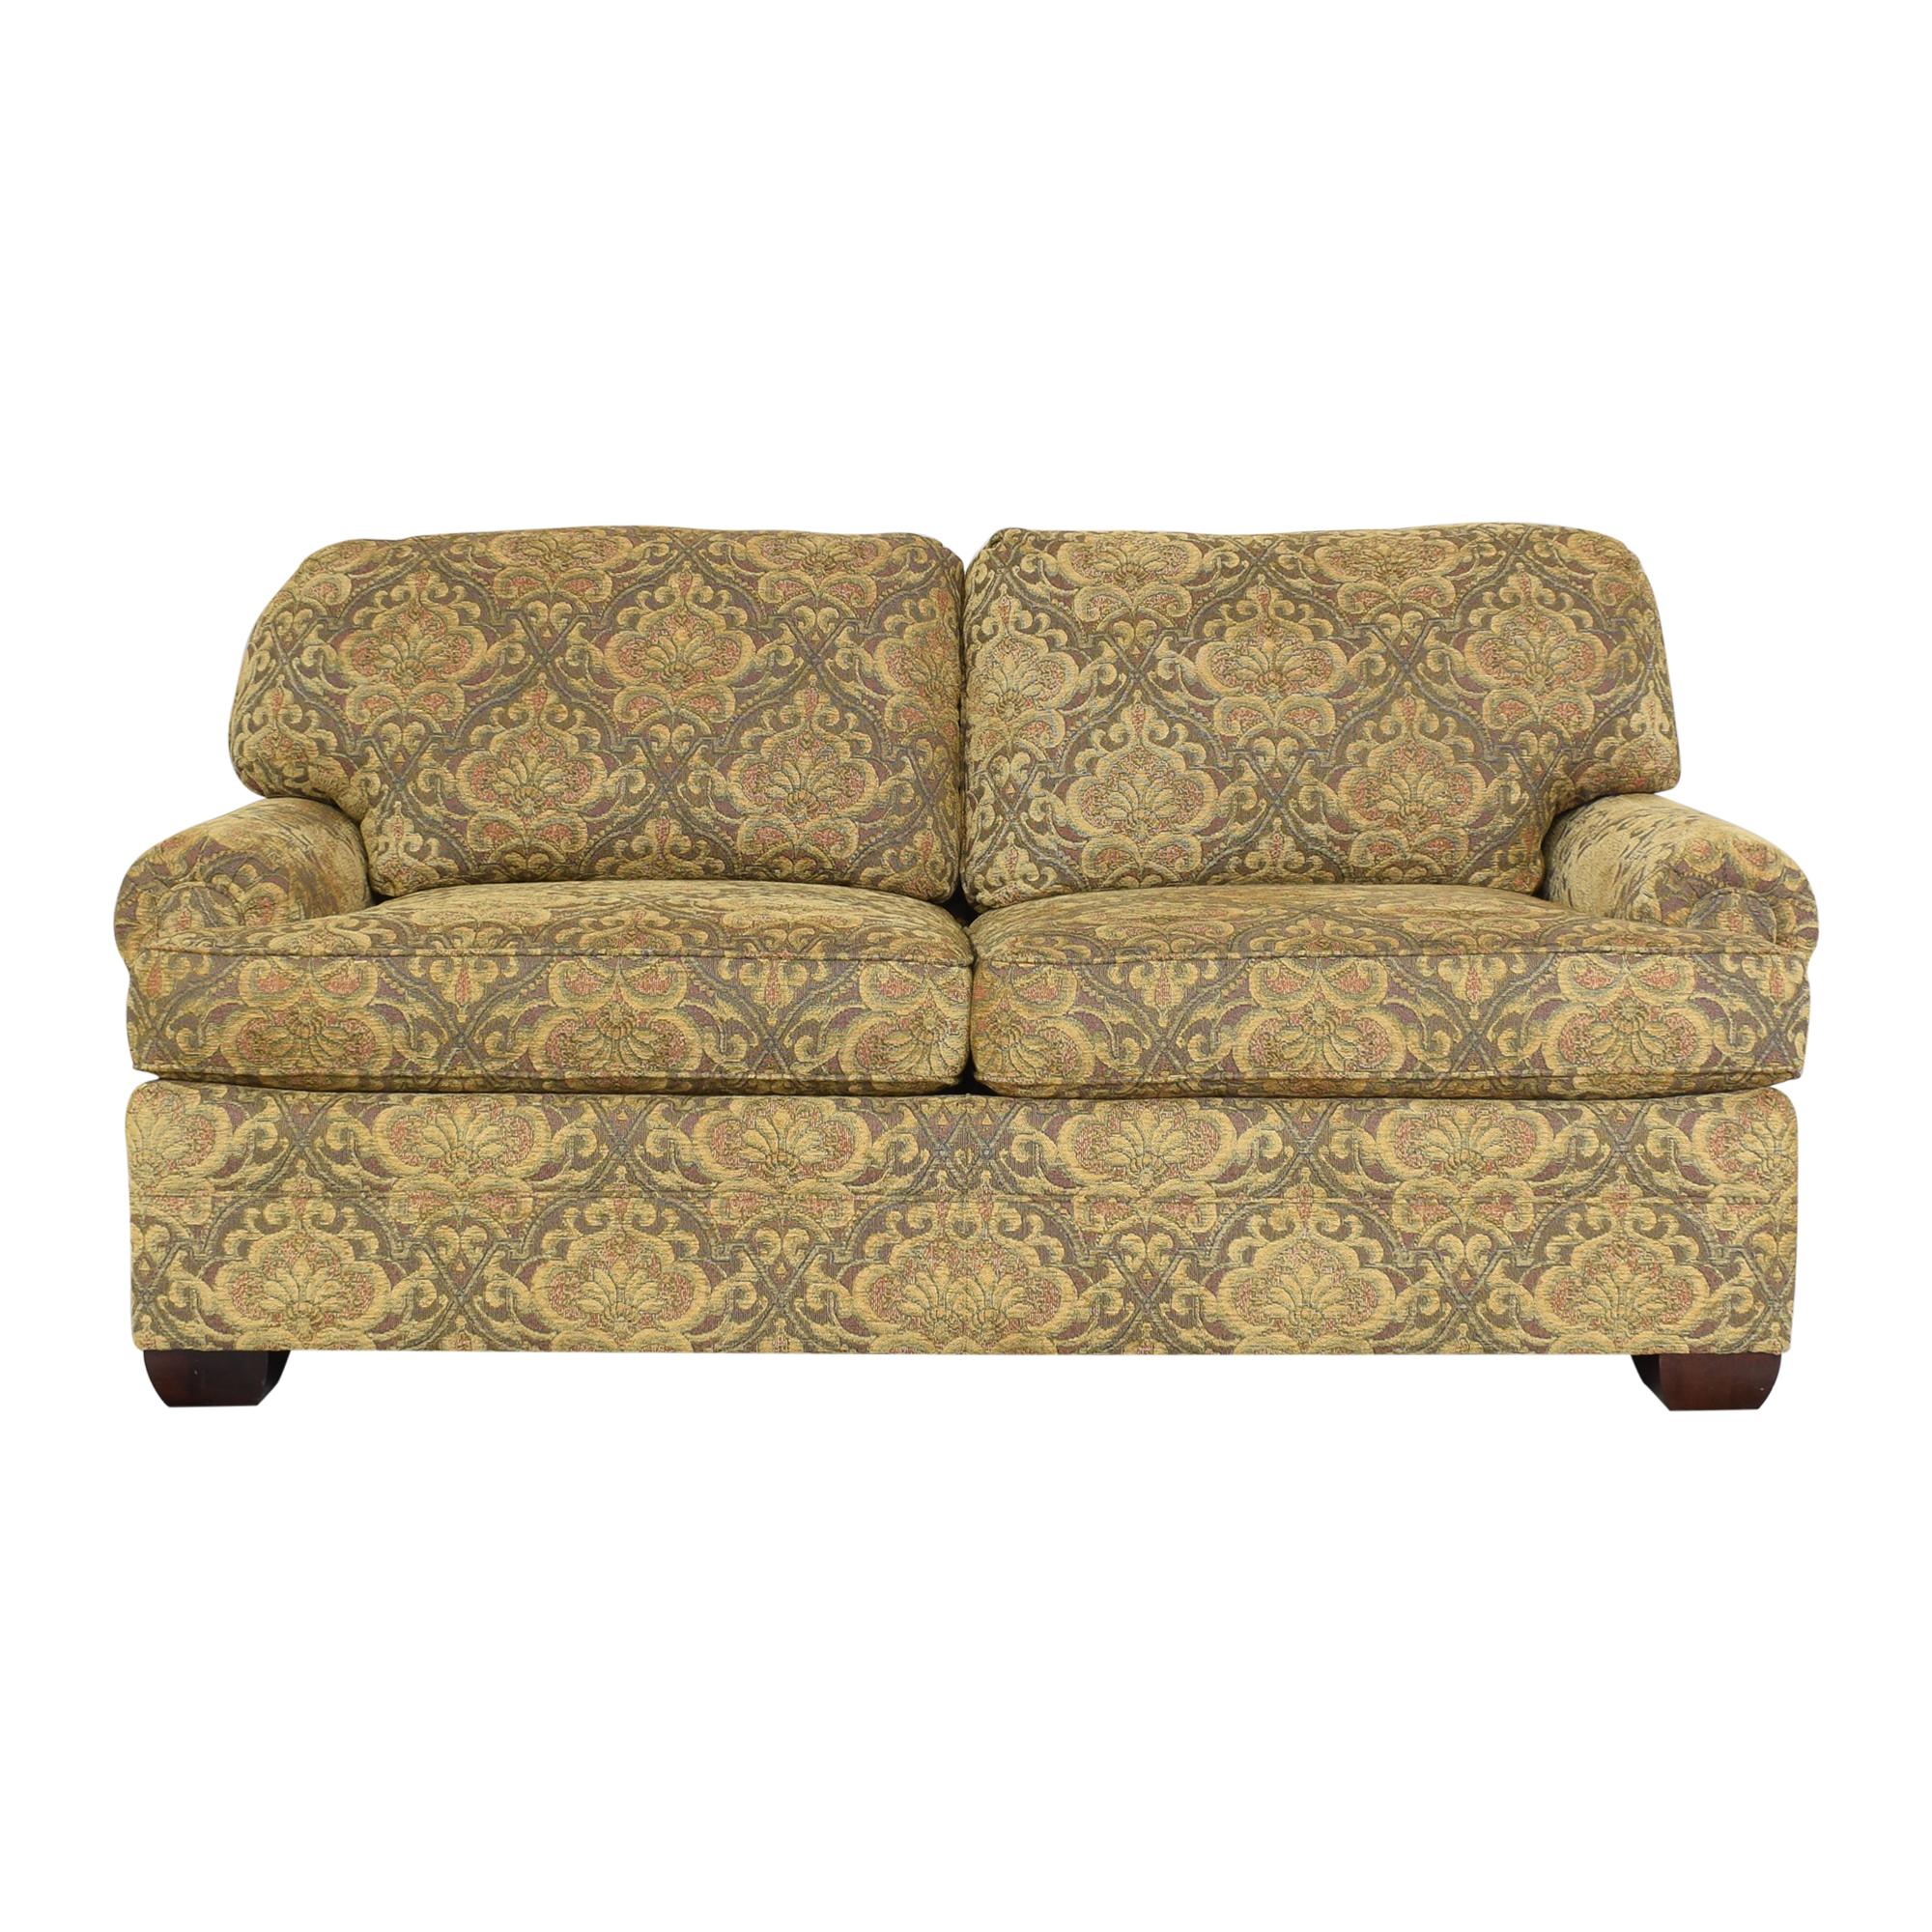 Taylor King Taylor King Custom Two Cushion Sofa discount